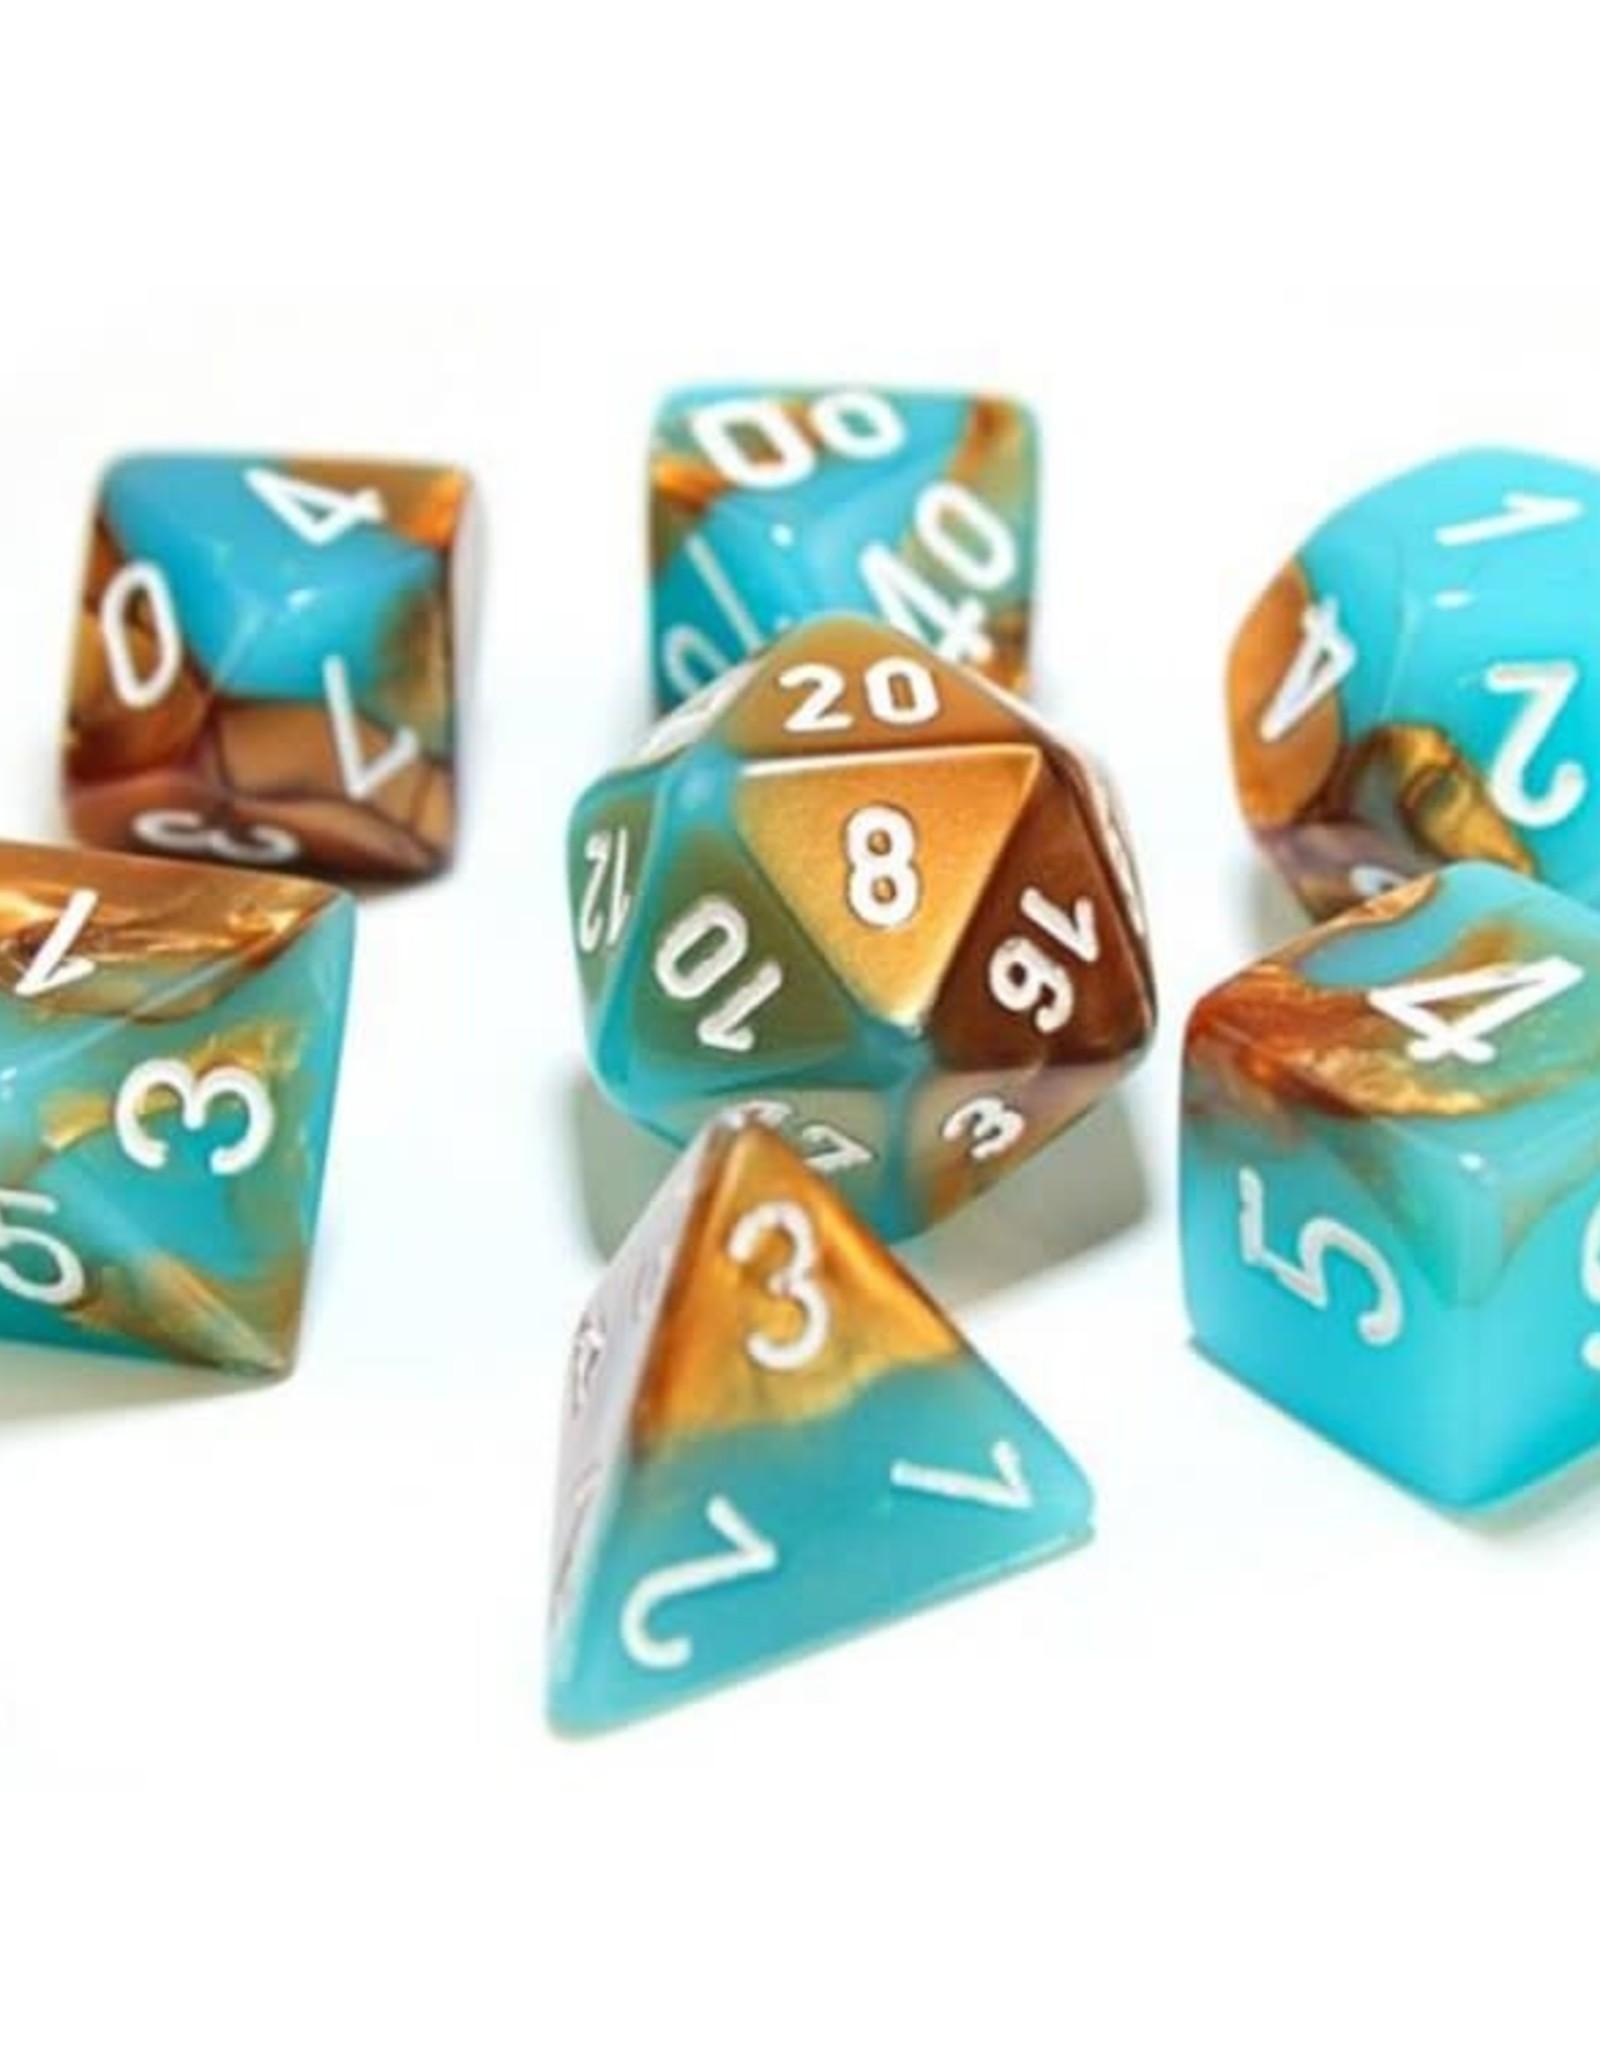 Chessex Lab Dice Luminary Gemini Poly 7 set: Copper & Turquoise w/ White